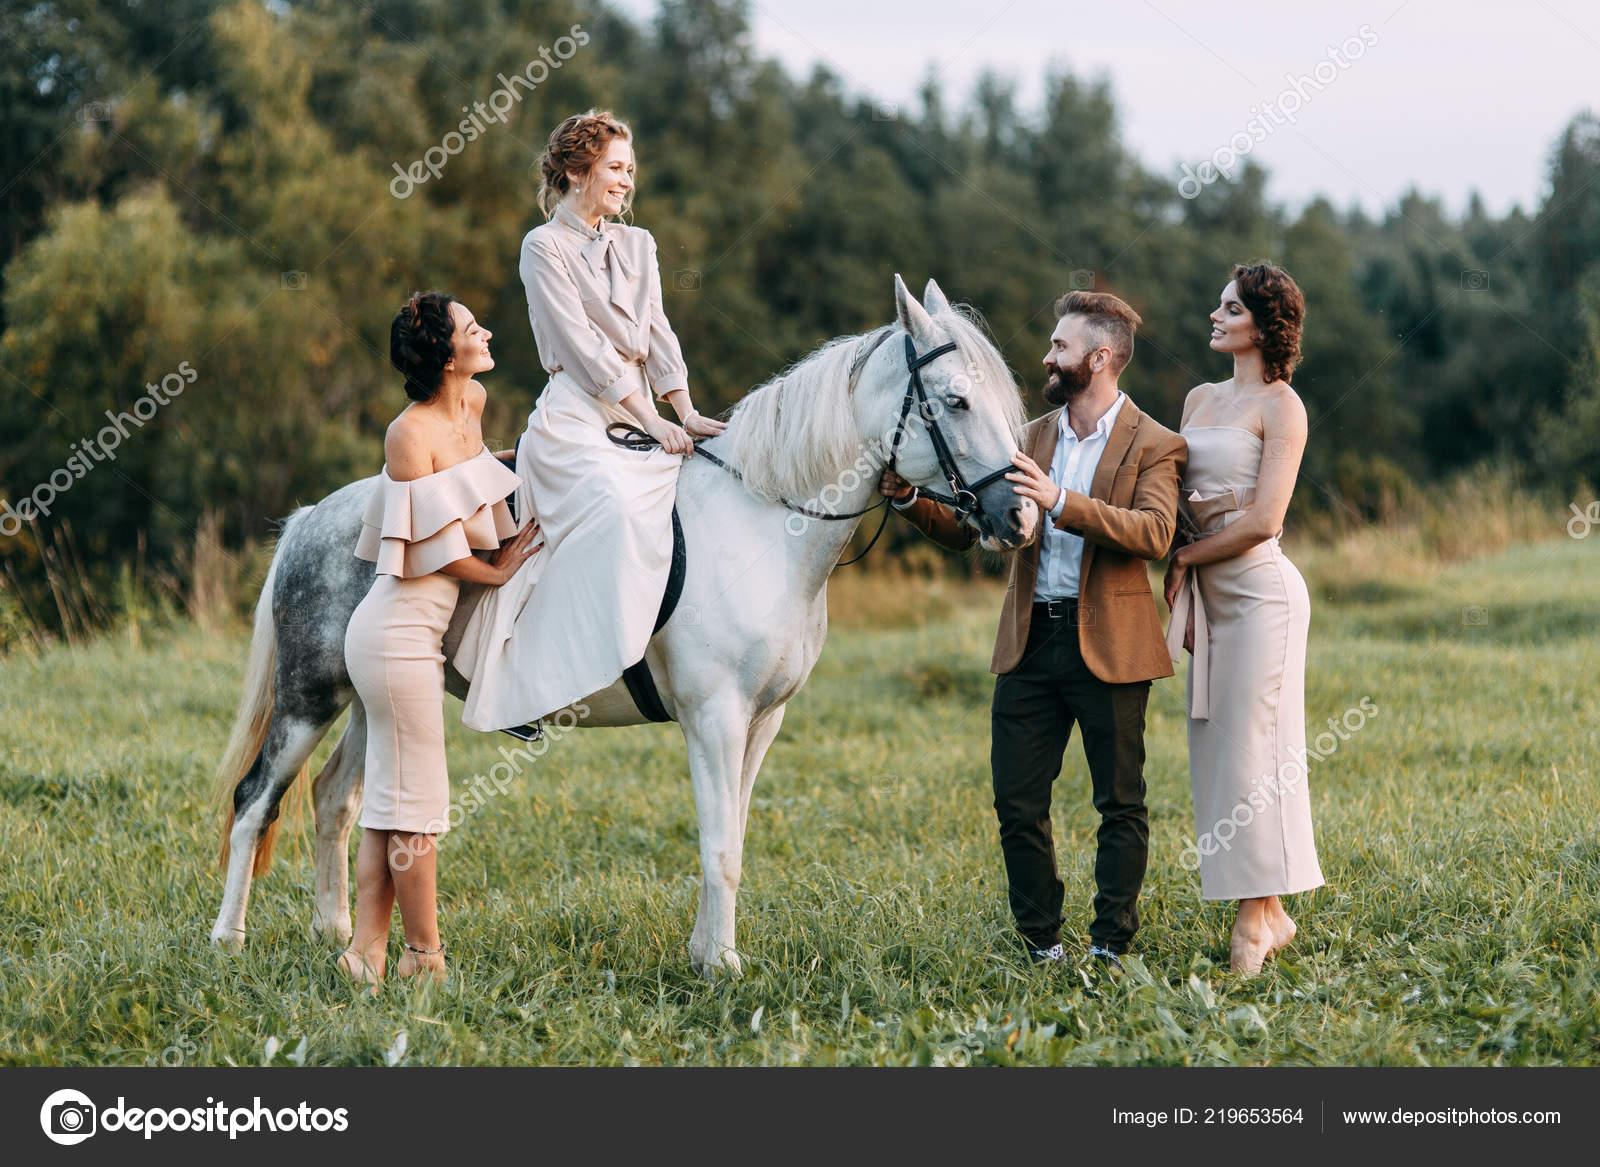 Wedding American Style Ranch Horse Walk Couples Fields Sunset Friends Stock Photo C Pavelvozmischev 219653564